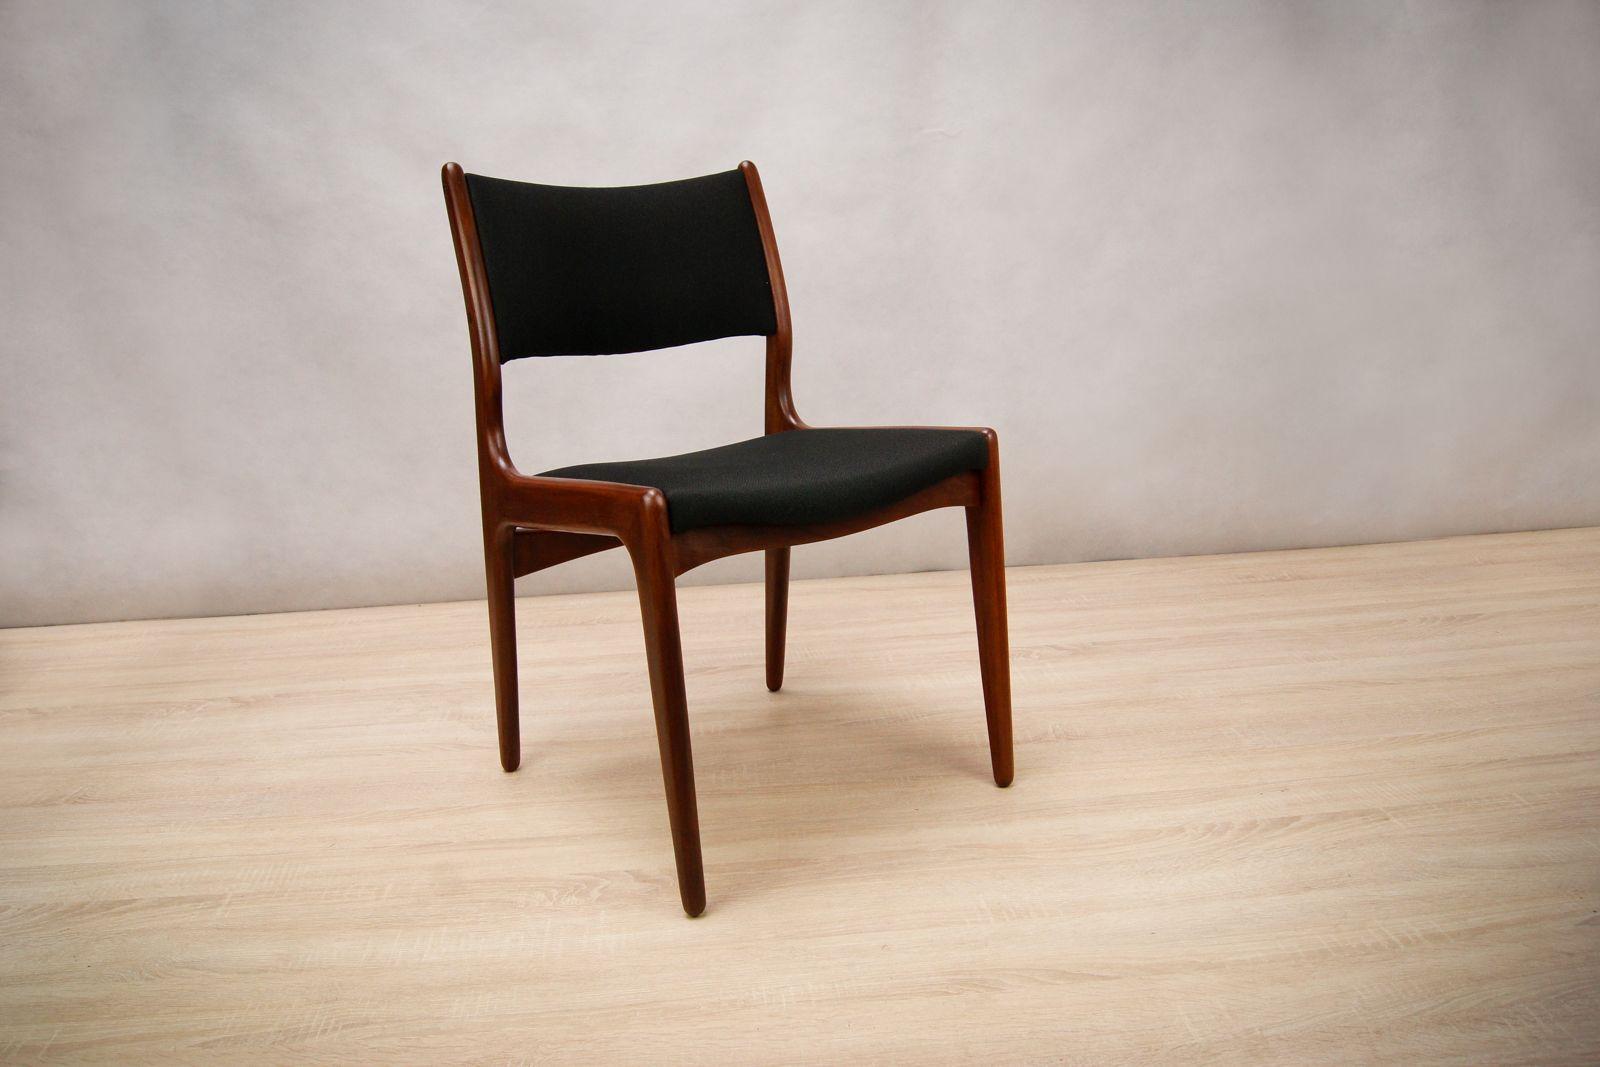 d nische mid century teak st hle 8er set bei pamono kaufen. Black Bedroom Furniture Sets. Home Design Ideas